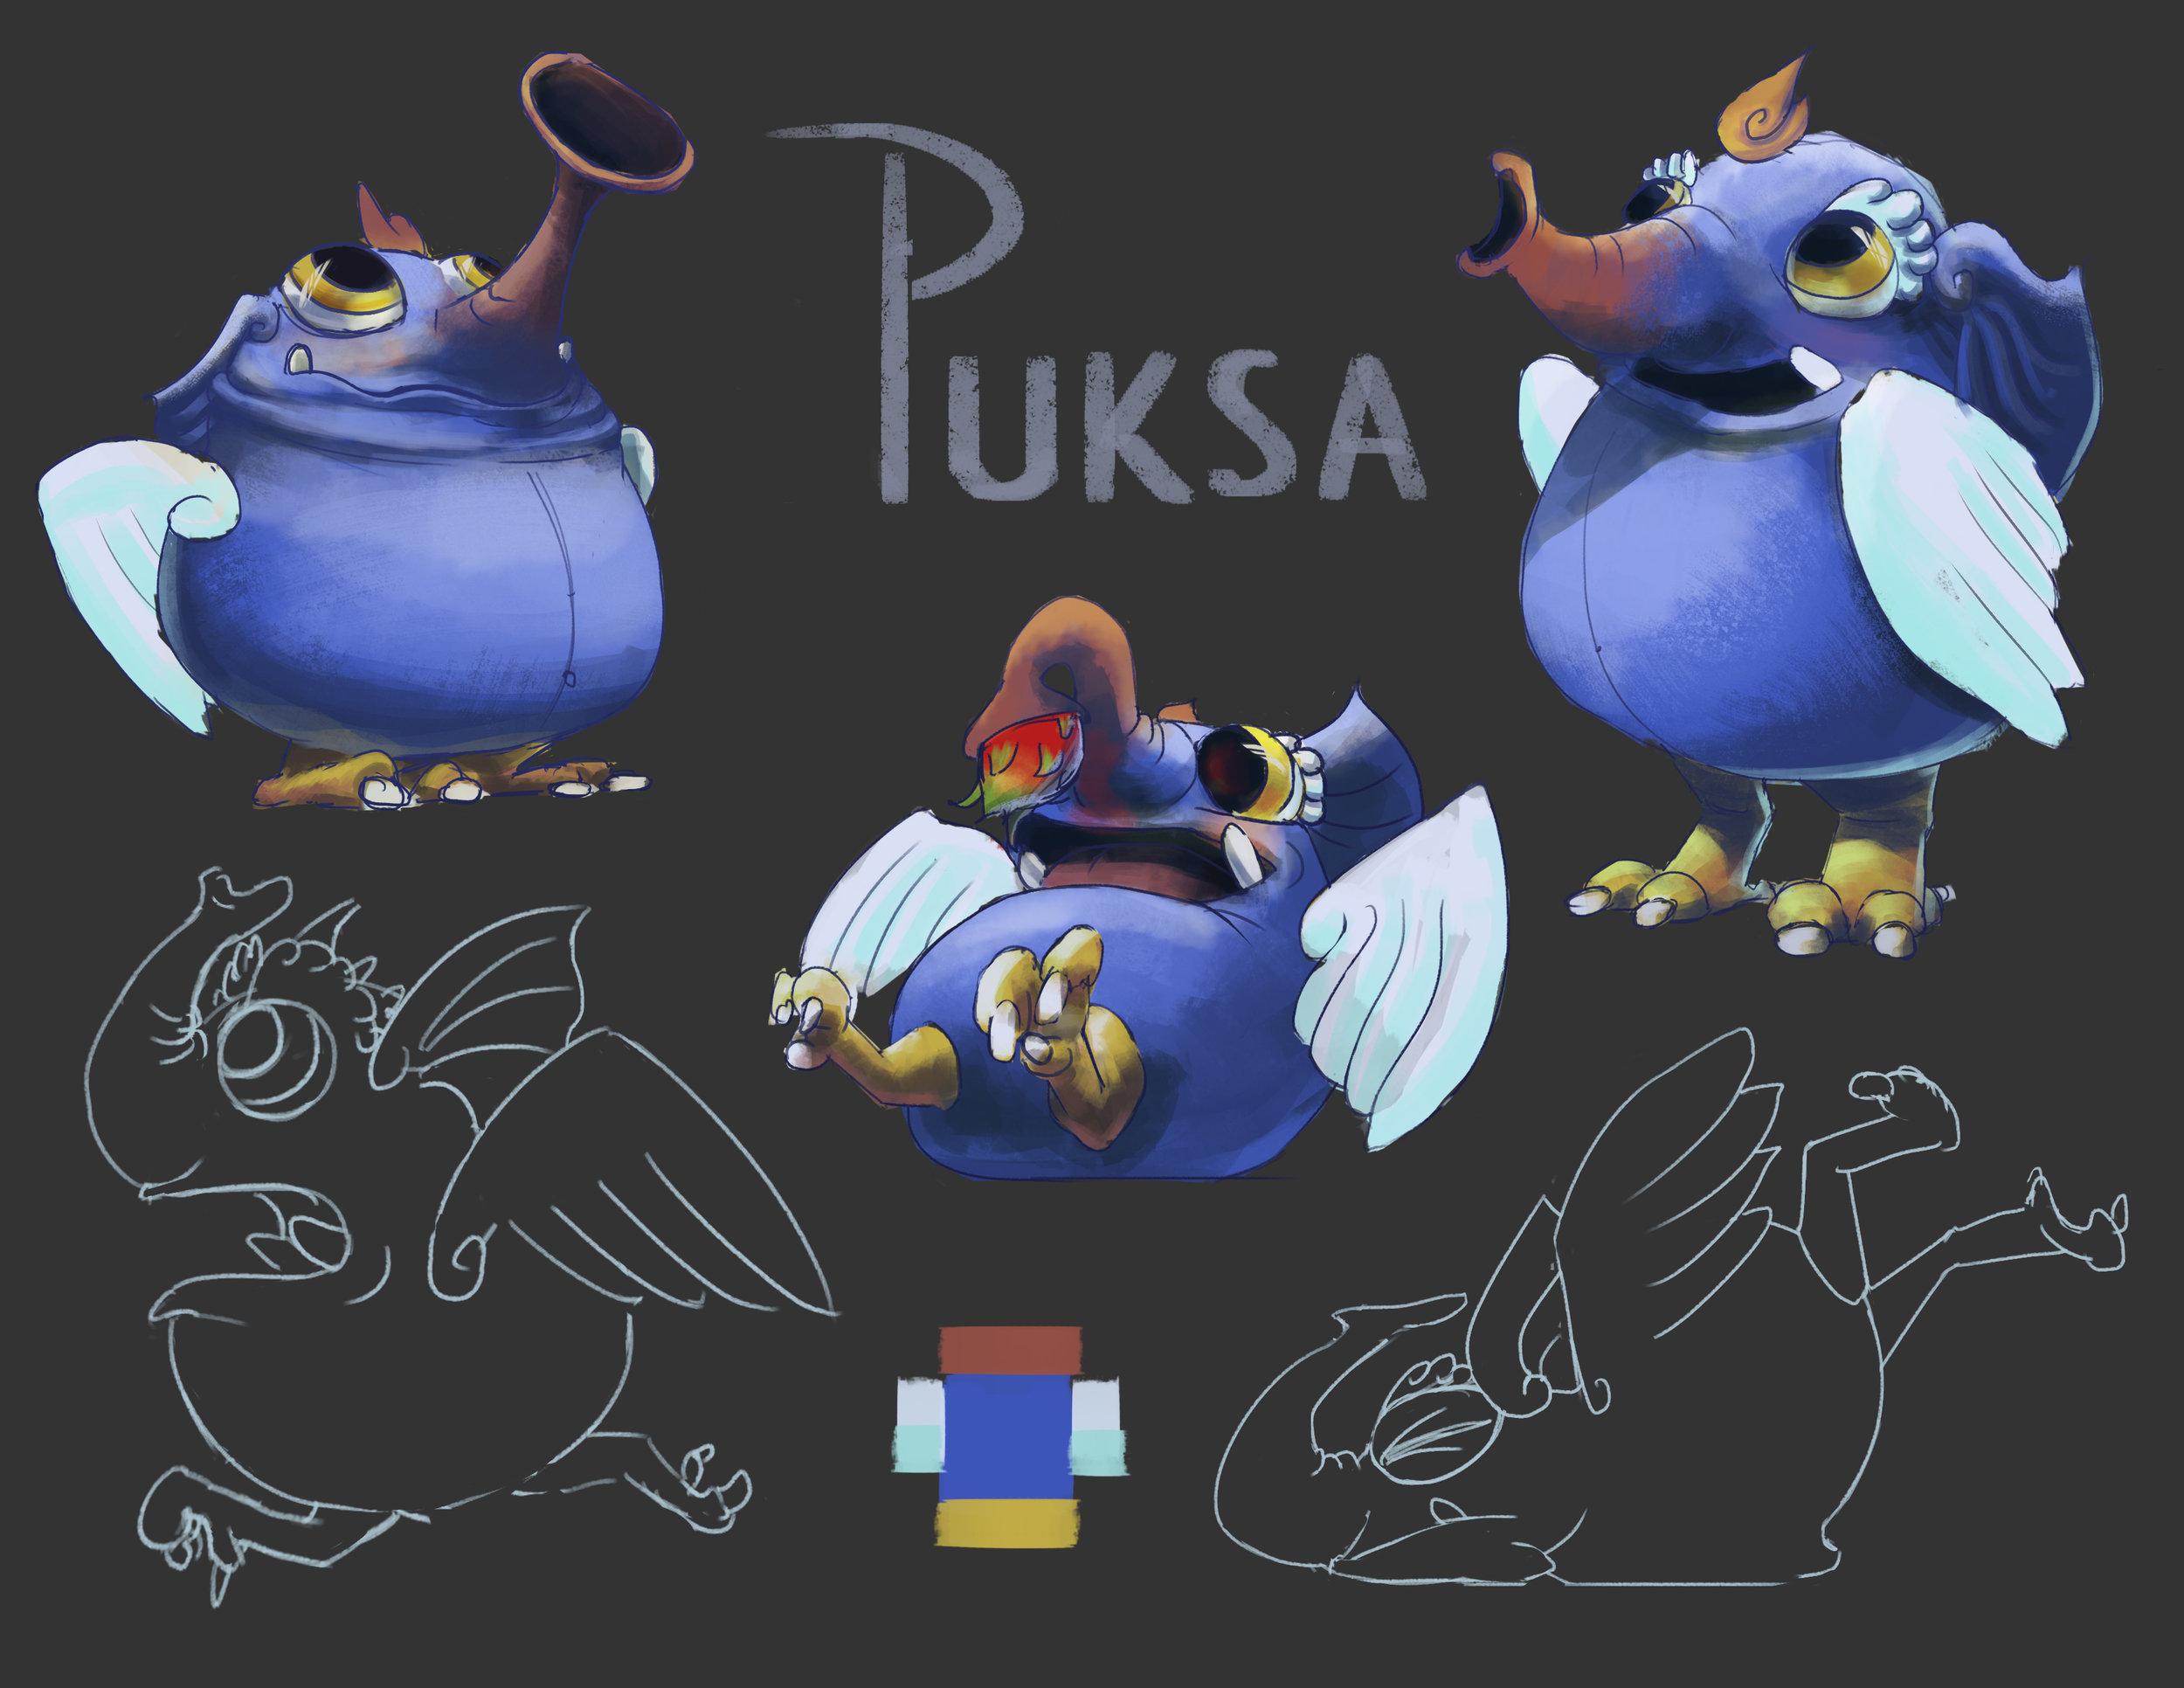 Puksa_Poses.jpg